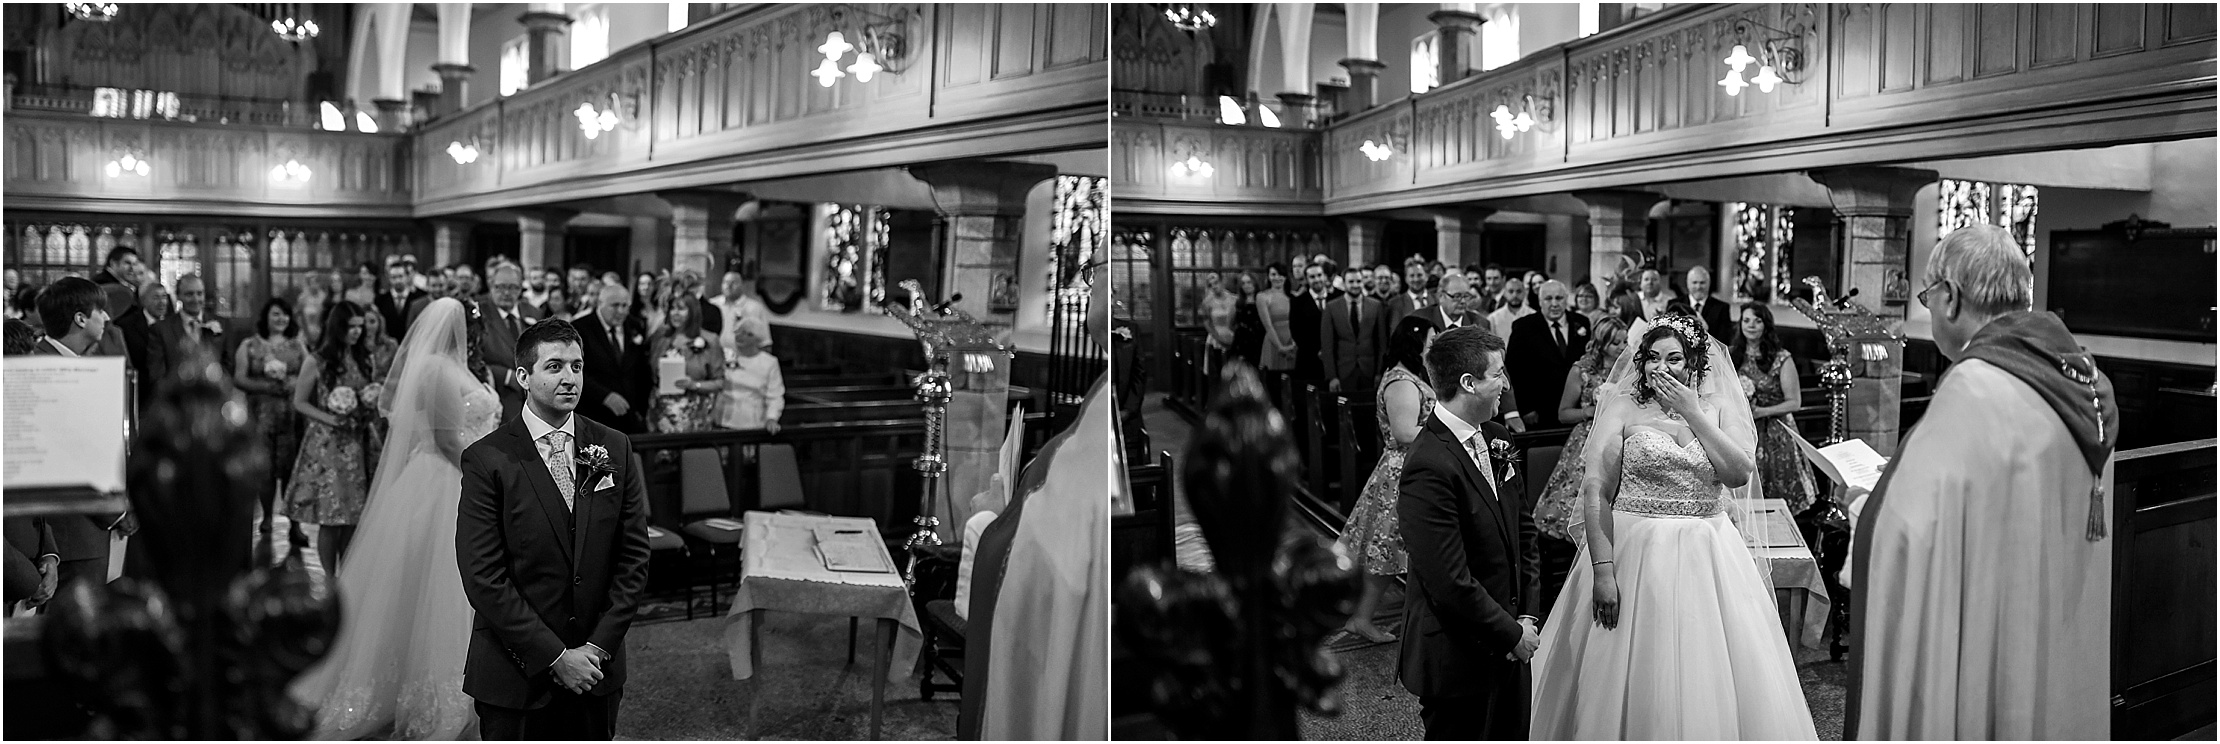 shireburn-arms-wedding- 047.jpg